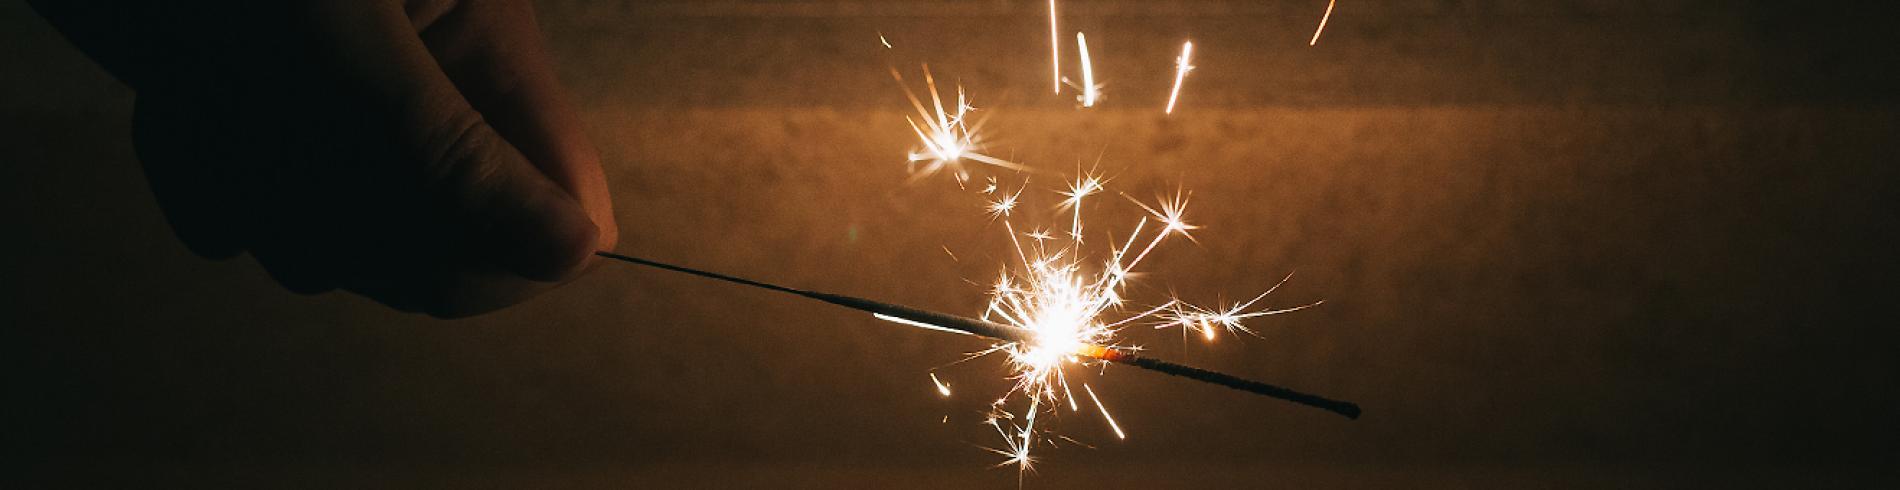 Happy 25th birthday from Eurostar